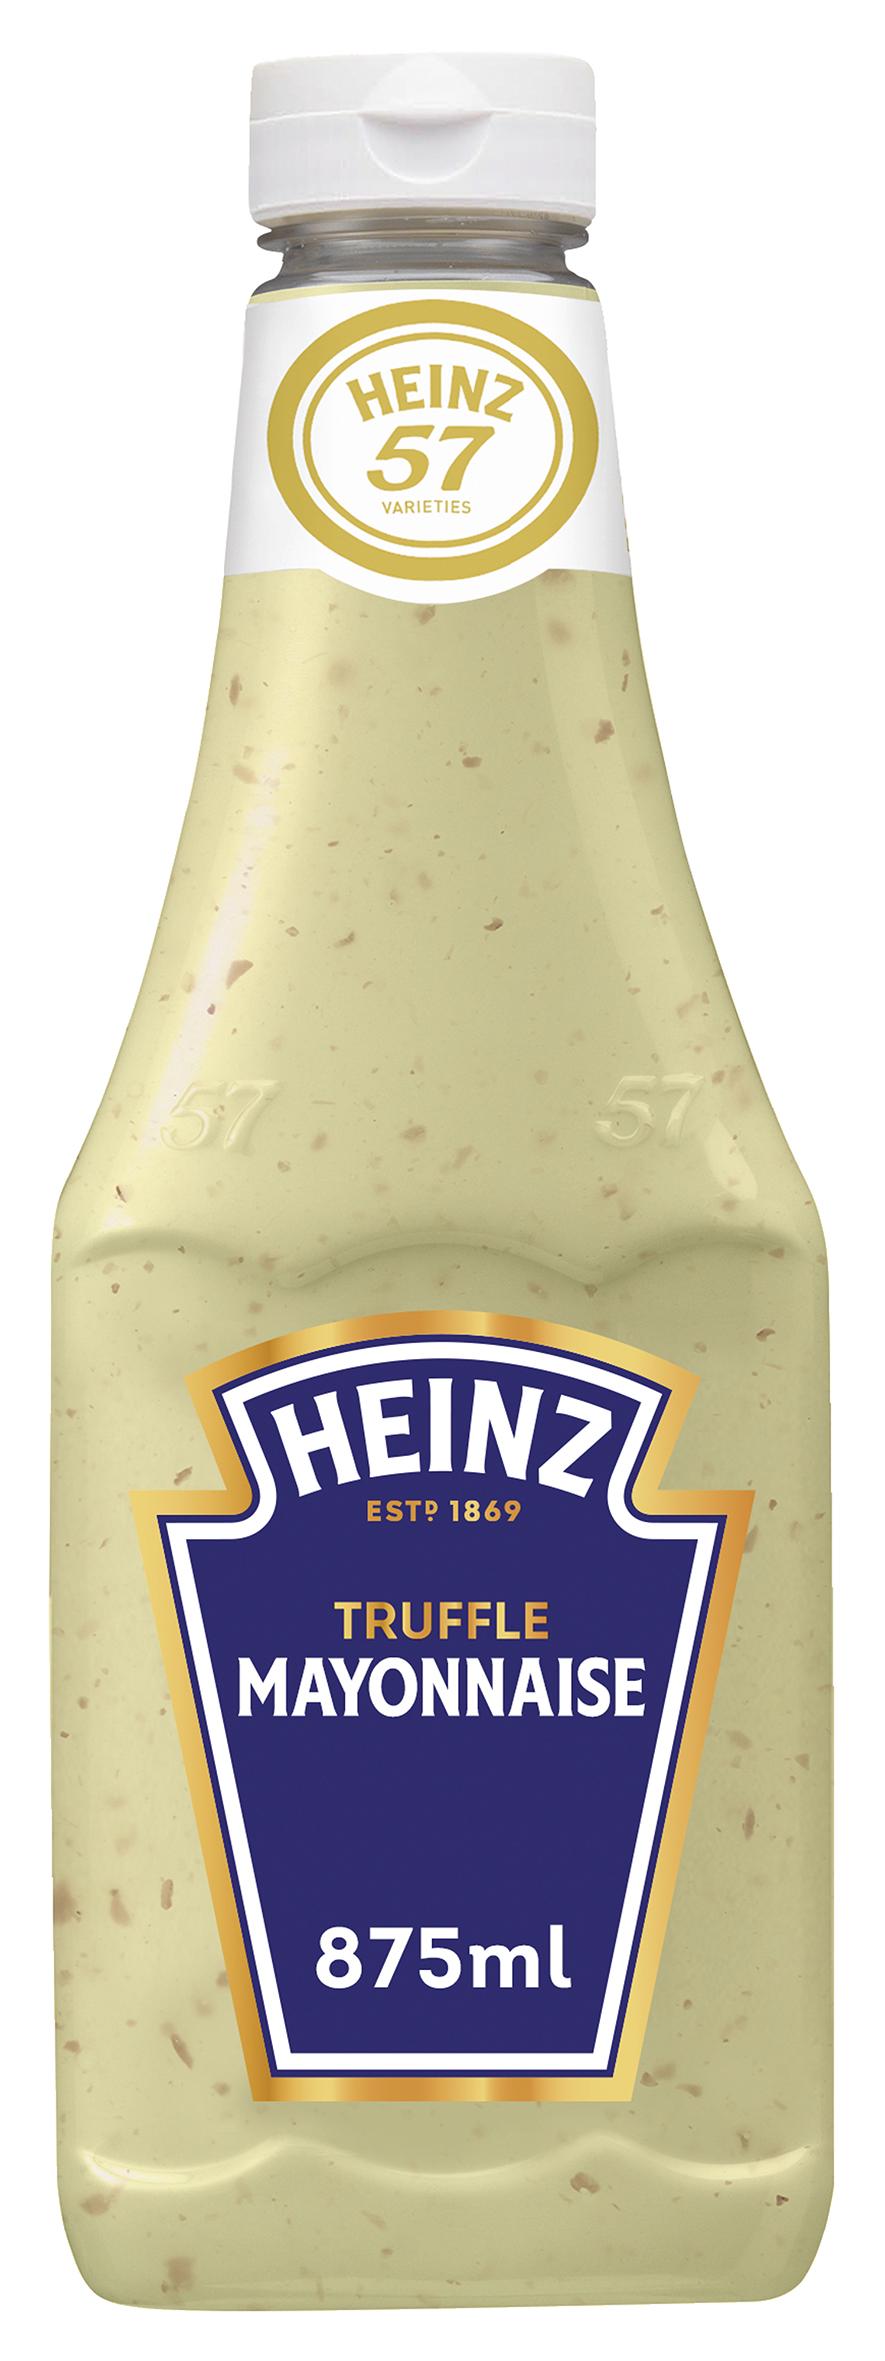 Heinz Trüffel Mayonnaise 875ml image